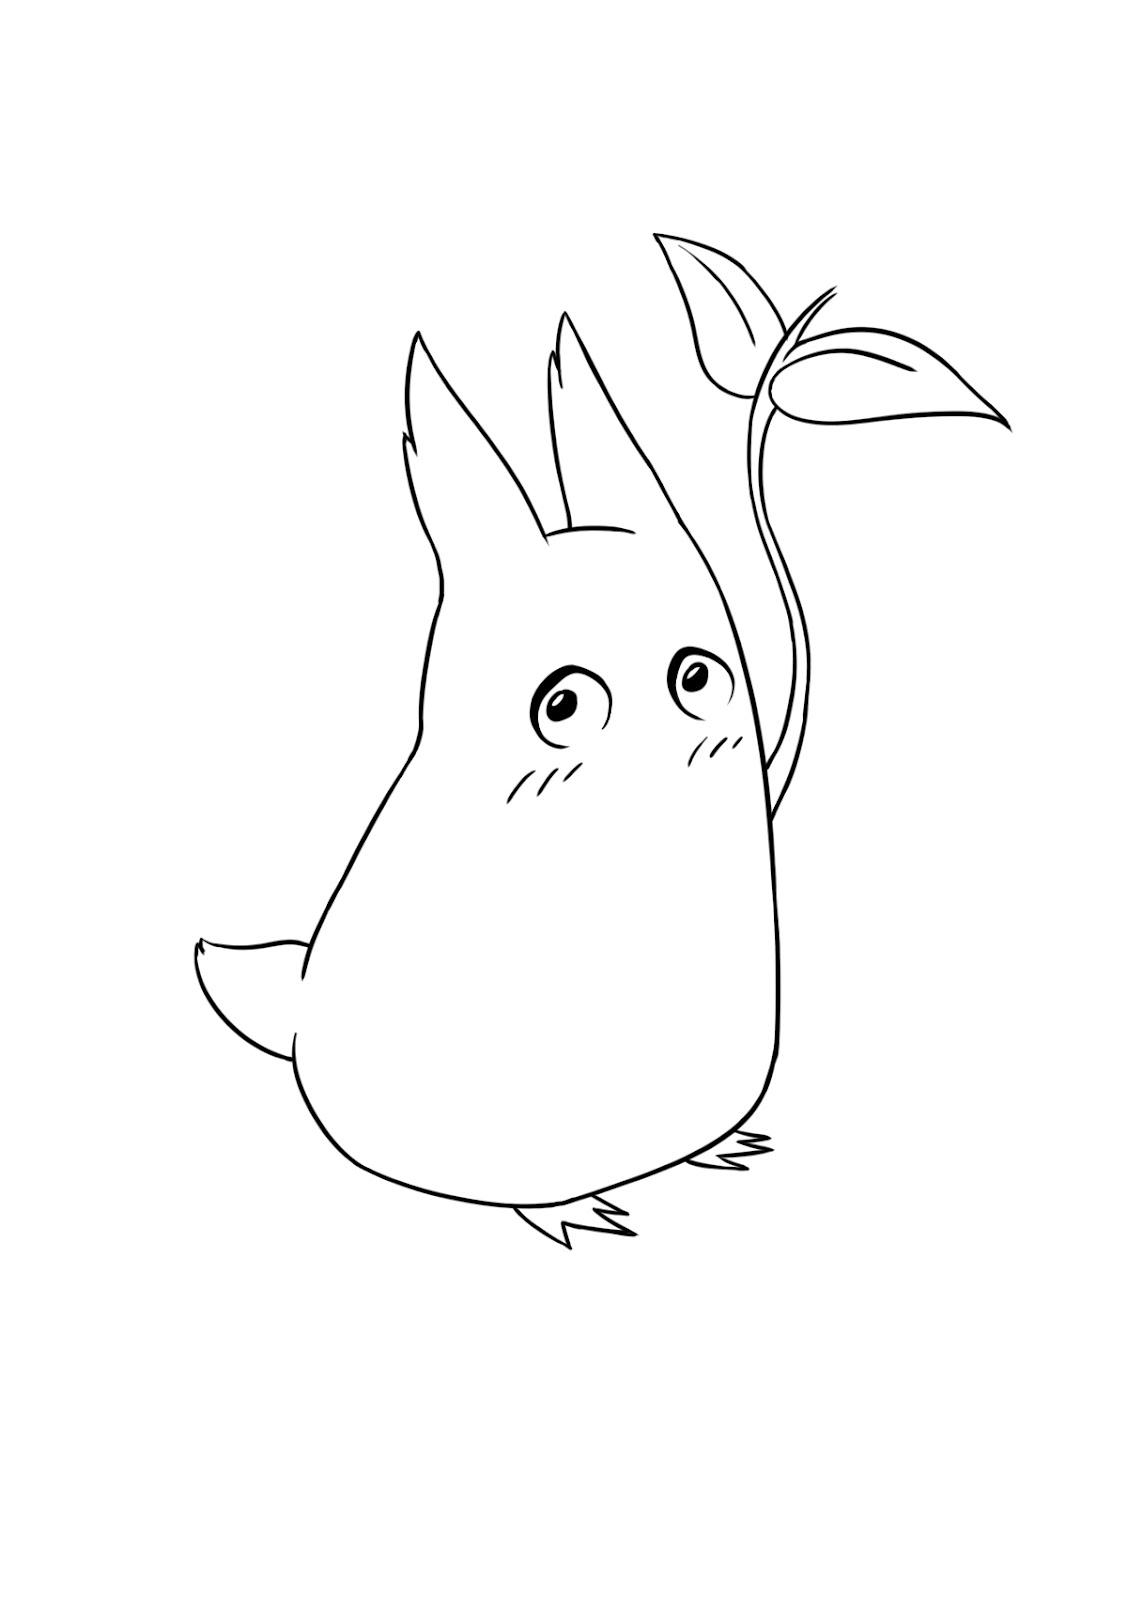 Mark's on Paper: Chibi Totoro